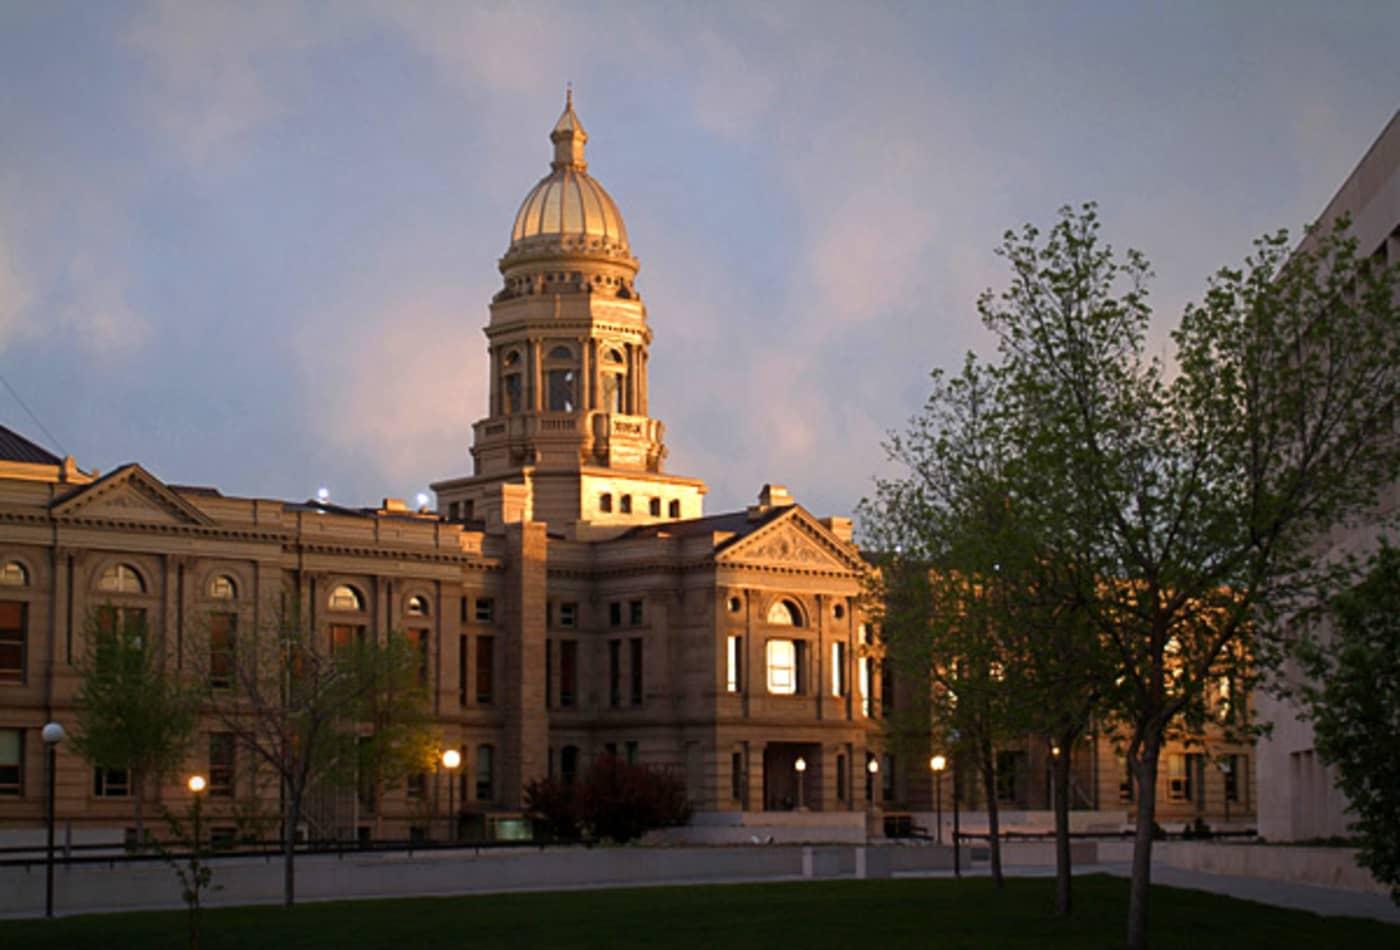 Wyoming-American-Tax-Havens-CNBC.jpg